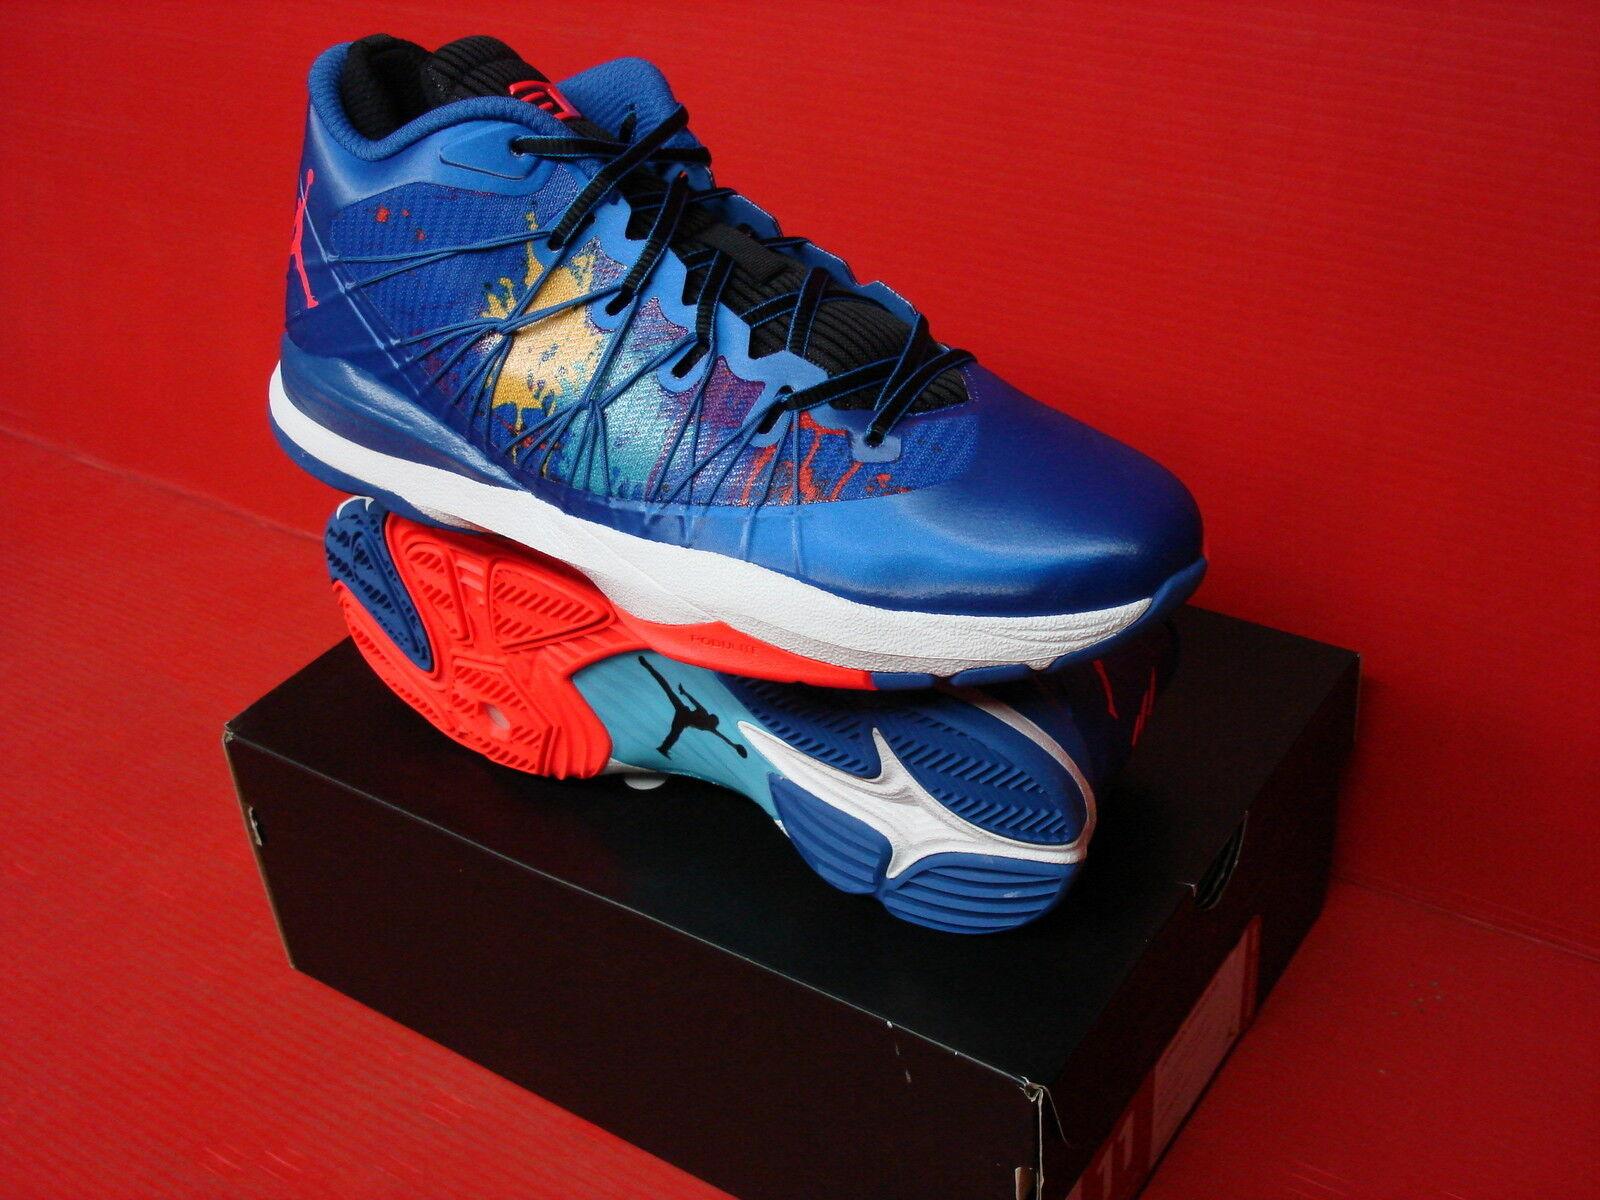 Nike jordan cp3.vii cp3.vii cp3.vii ae mens basektball 644805 ec6576